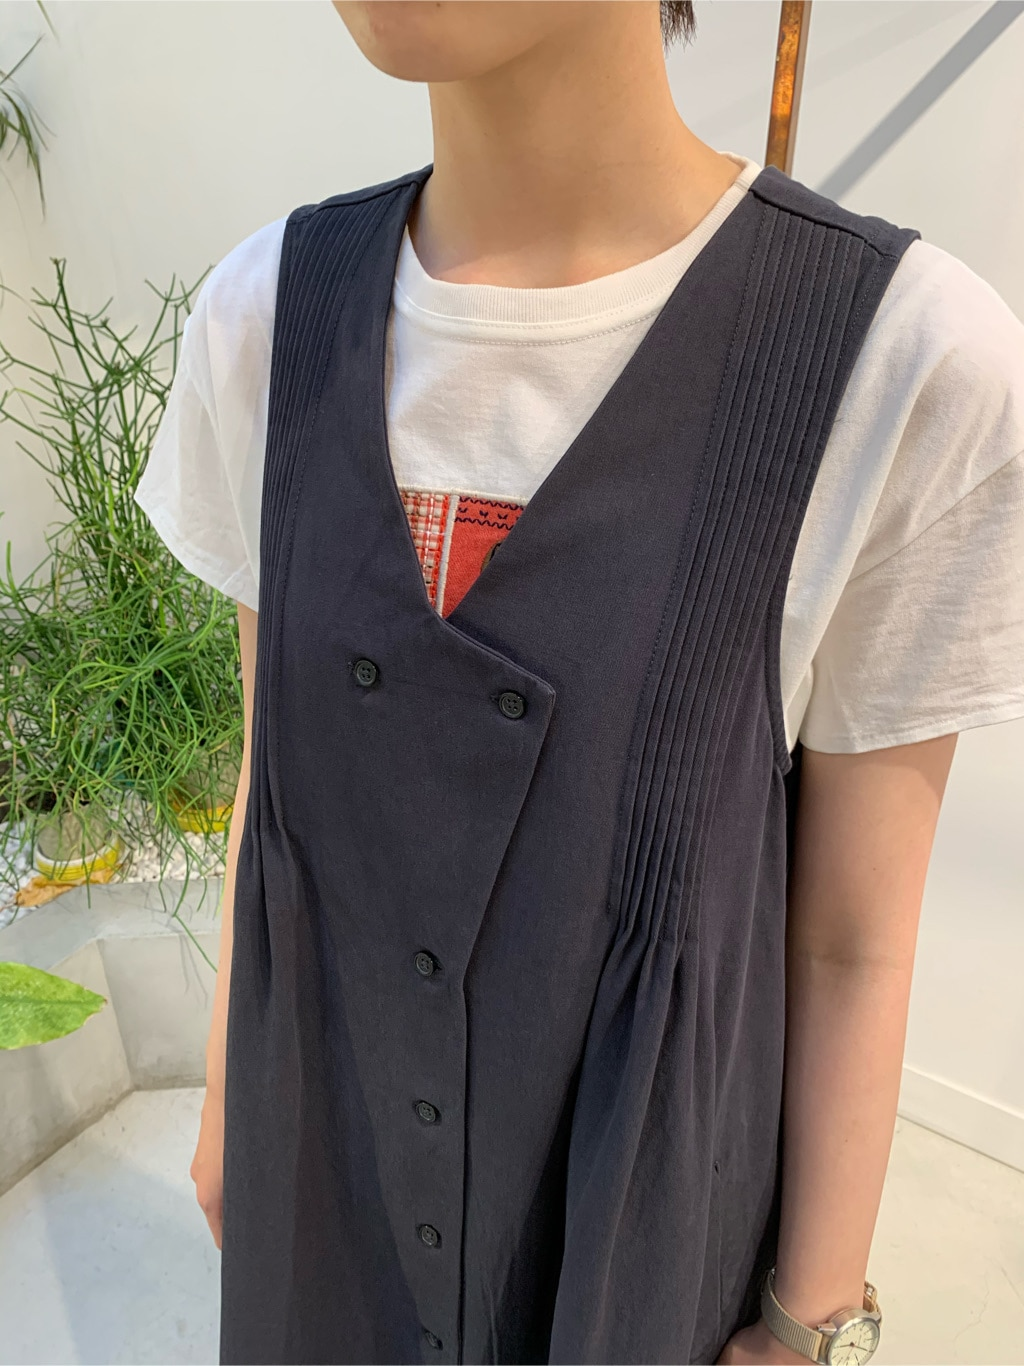 l'atelier du savon 名古屋栄路面 身長:161cm 2020.06.06